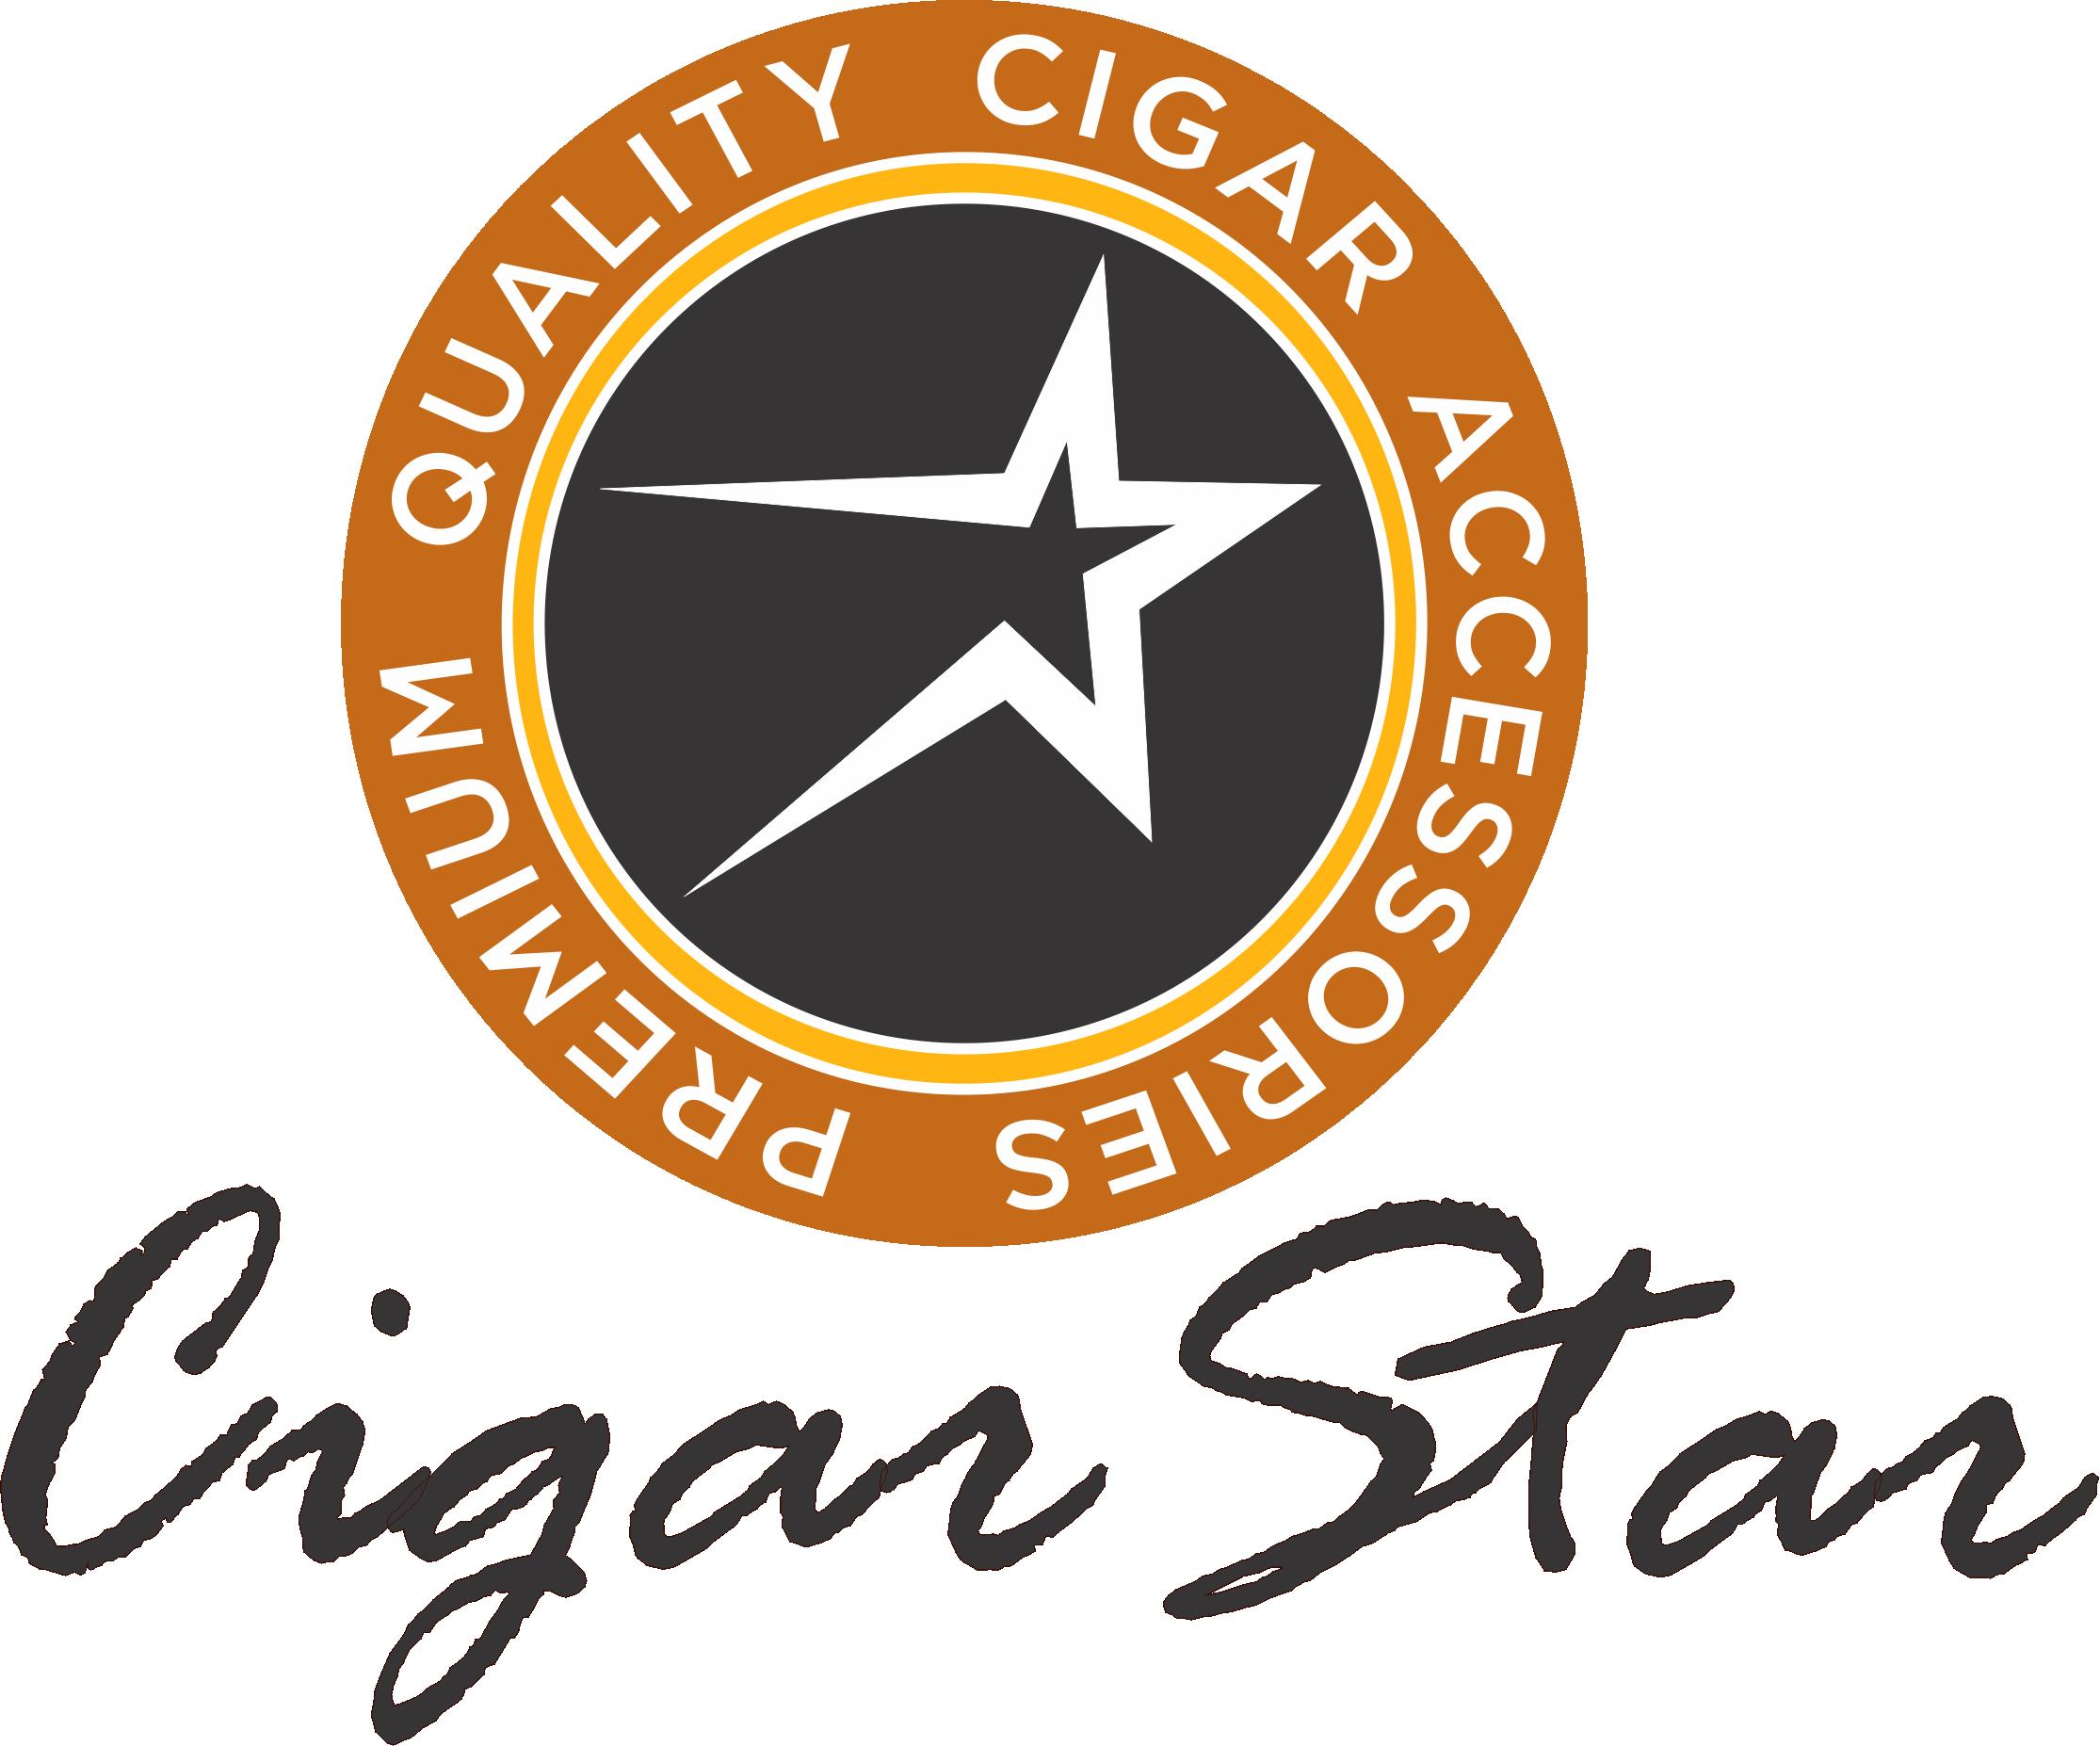 Cigar Star Coupon Code & Deals